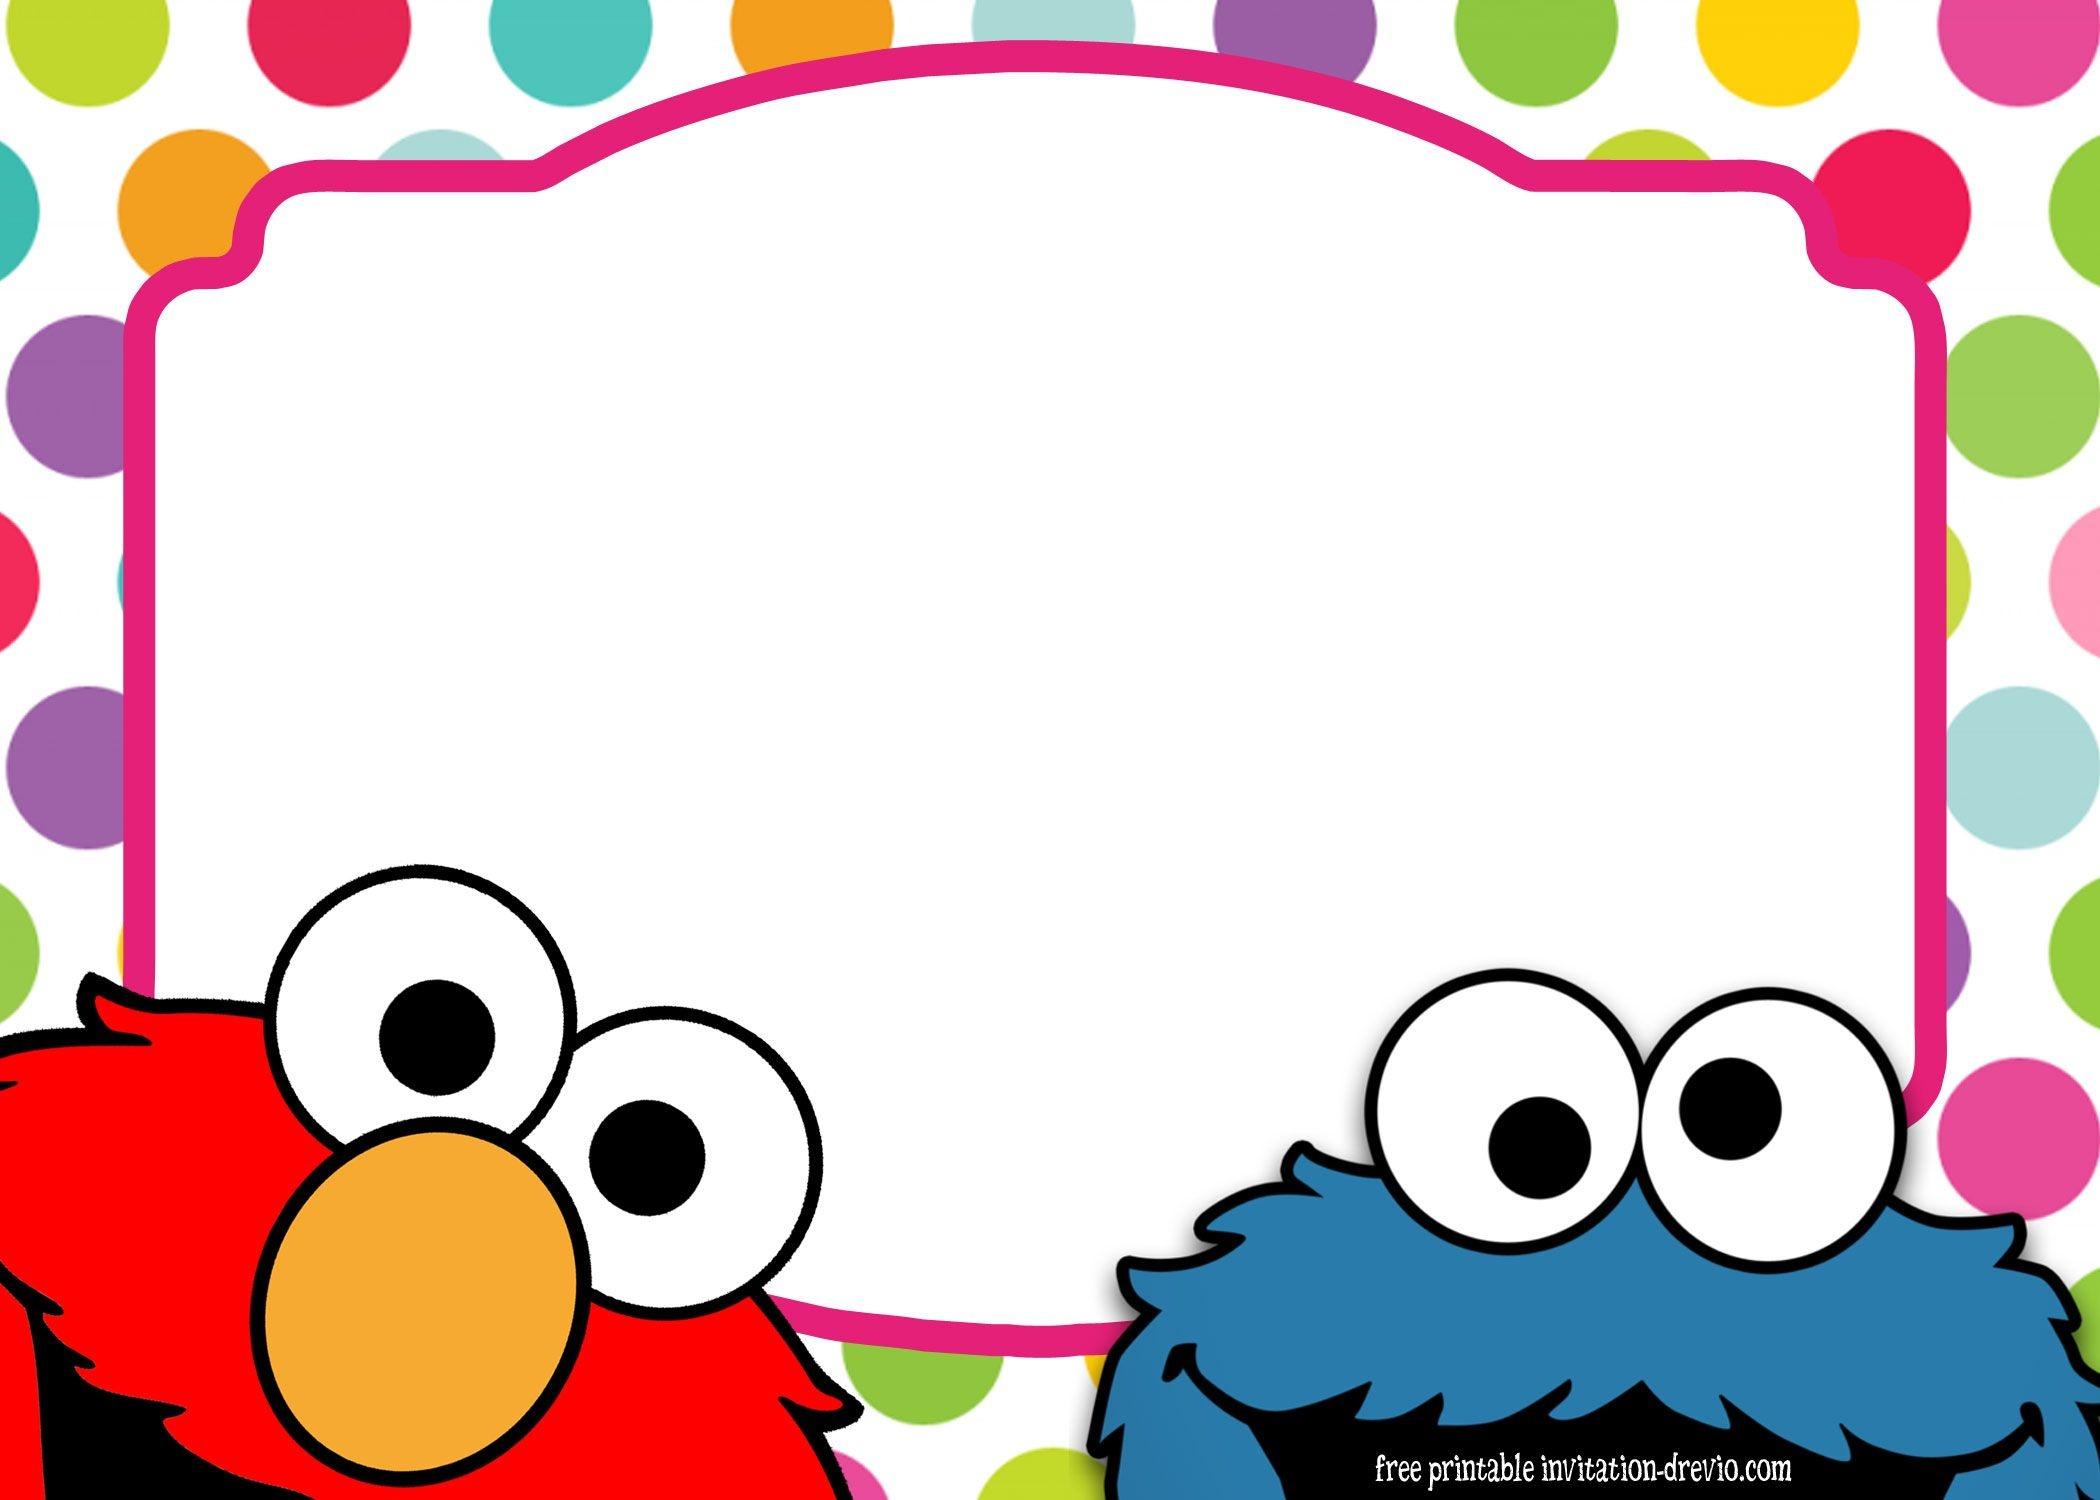 Sesame Street Twin Birthday Invitation | Free Printable Birthday - Free Printable Cookie Monster Birthday Invitations